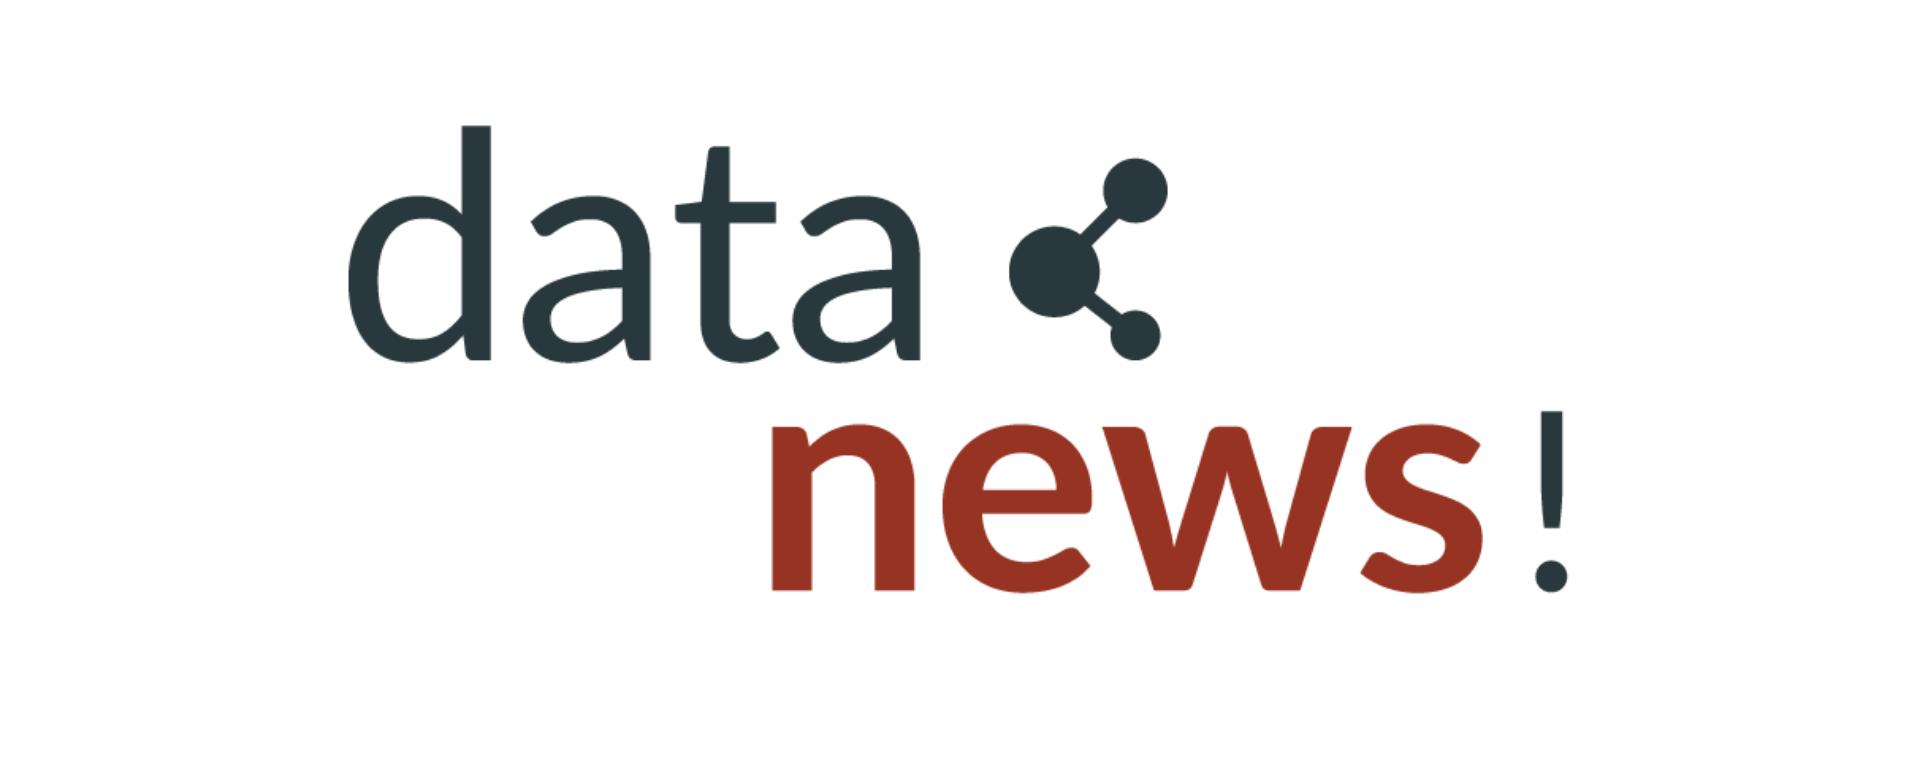 Graphic reading 'data news!'